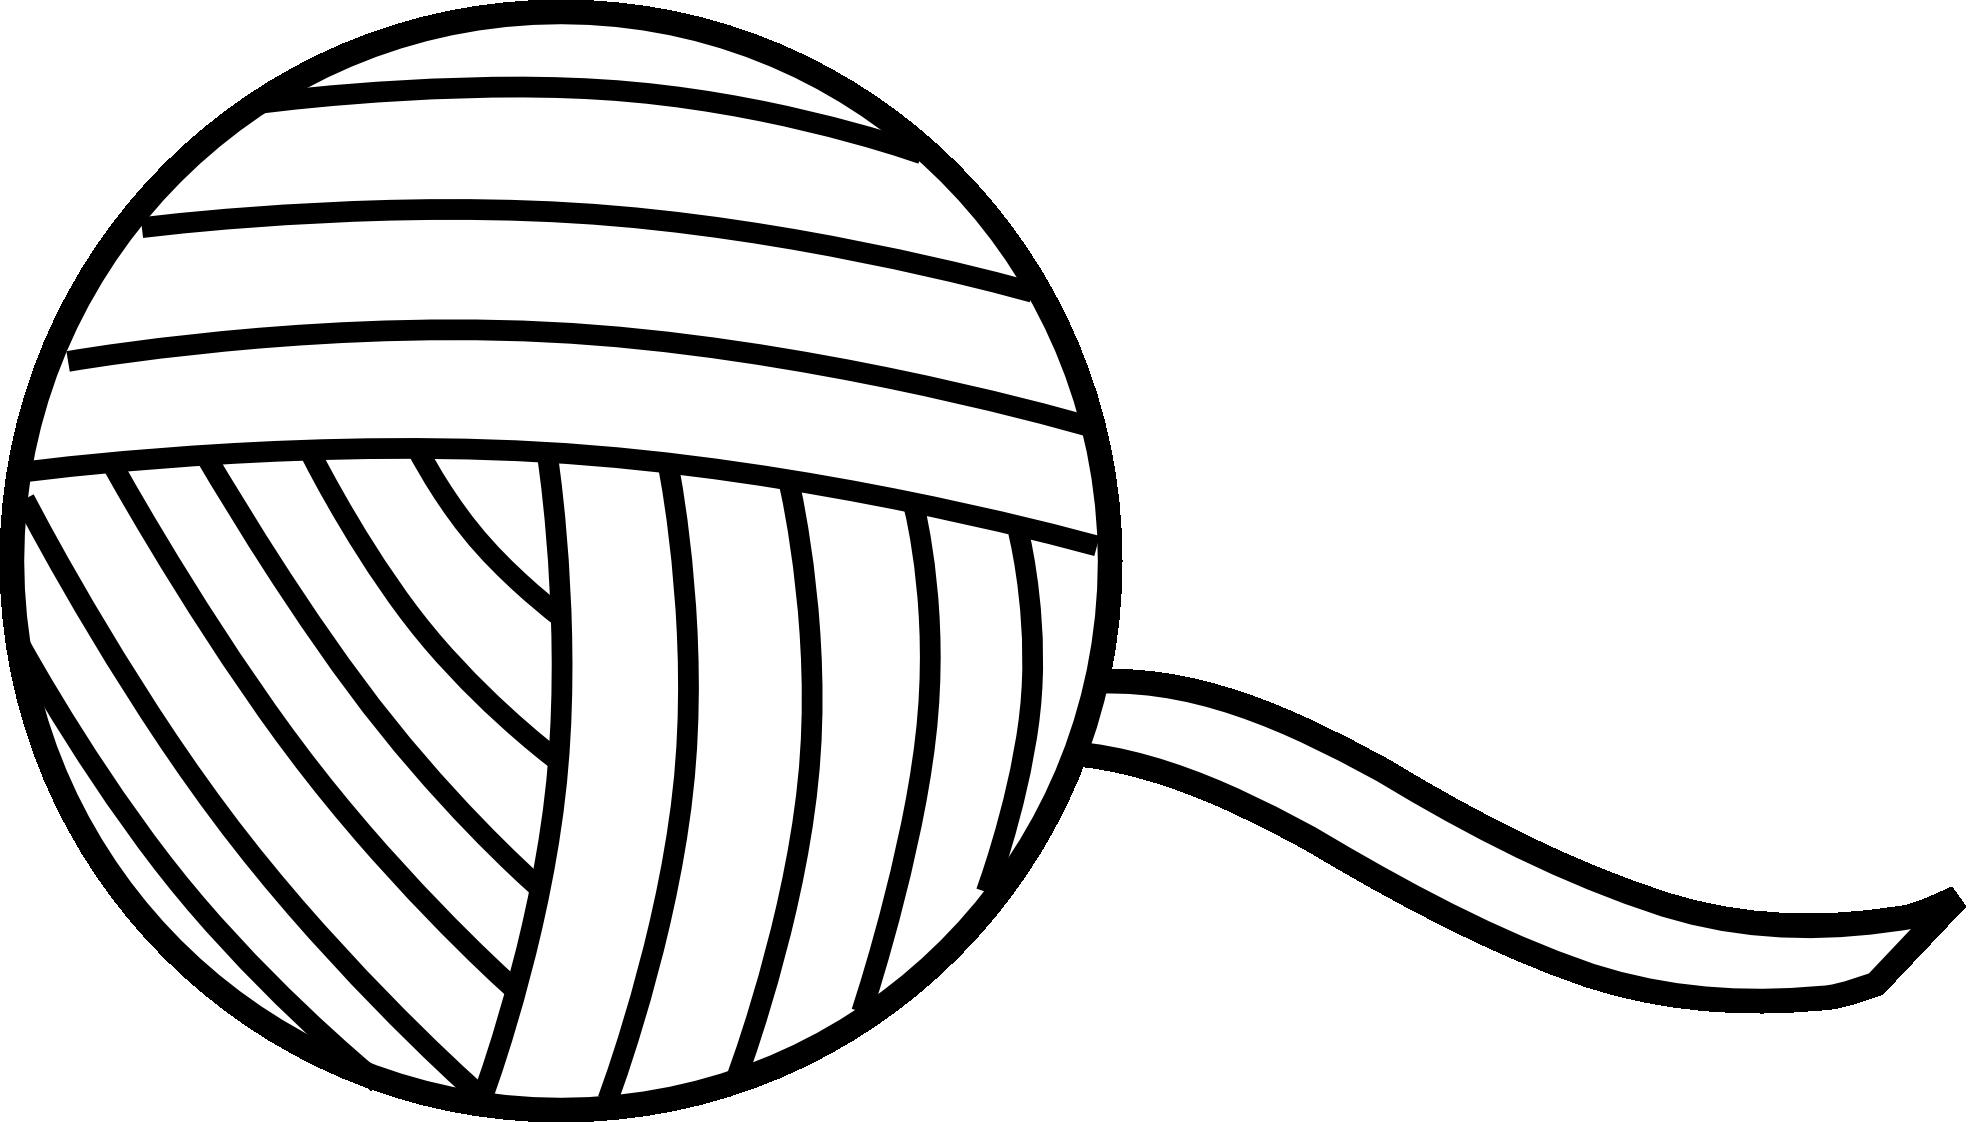 Ball Of Yarn Clipart #1 .